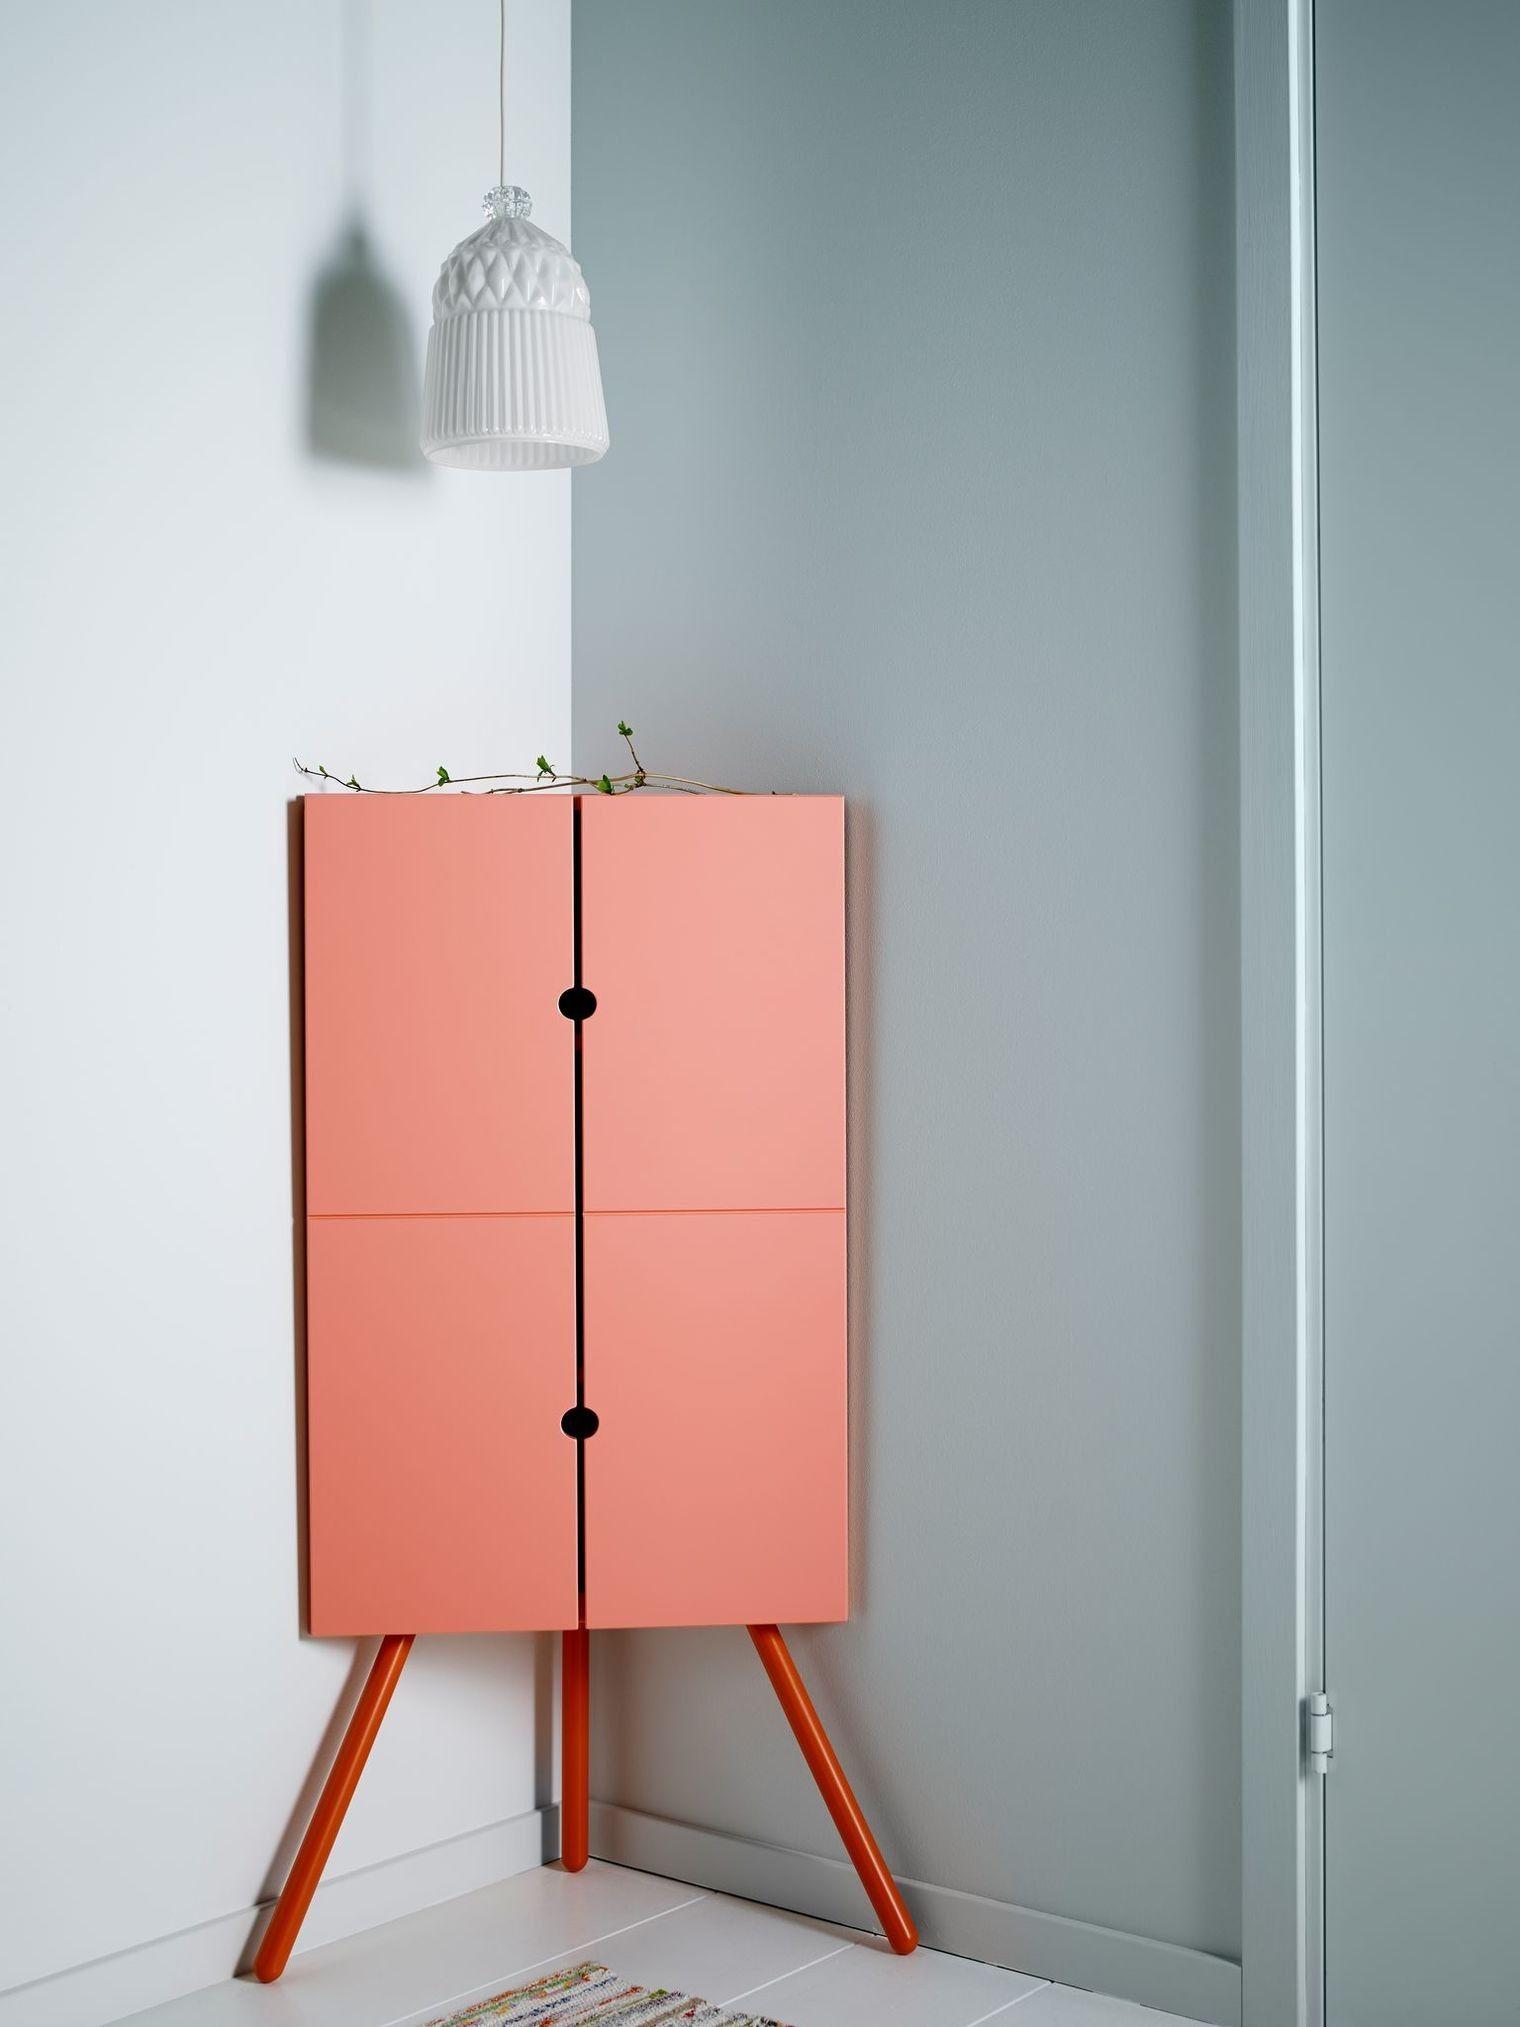 Meuble D Angle Ikea Maison Design Apsip Com Avec Meuble D Angle